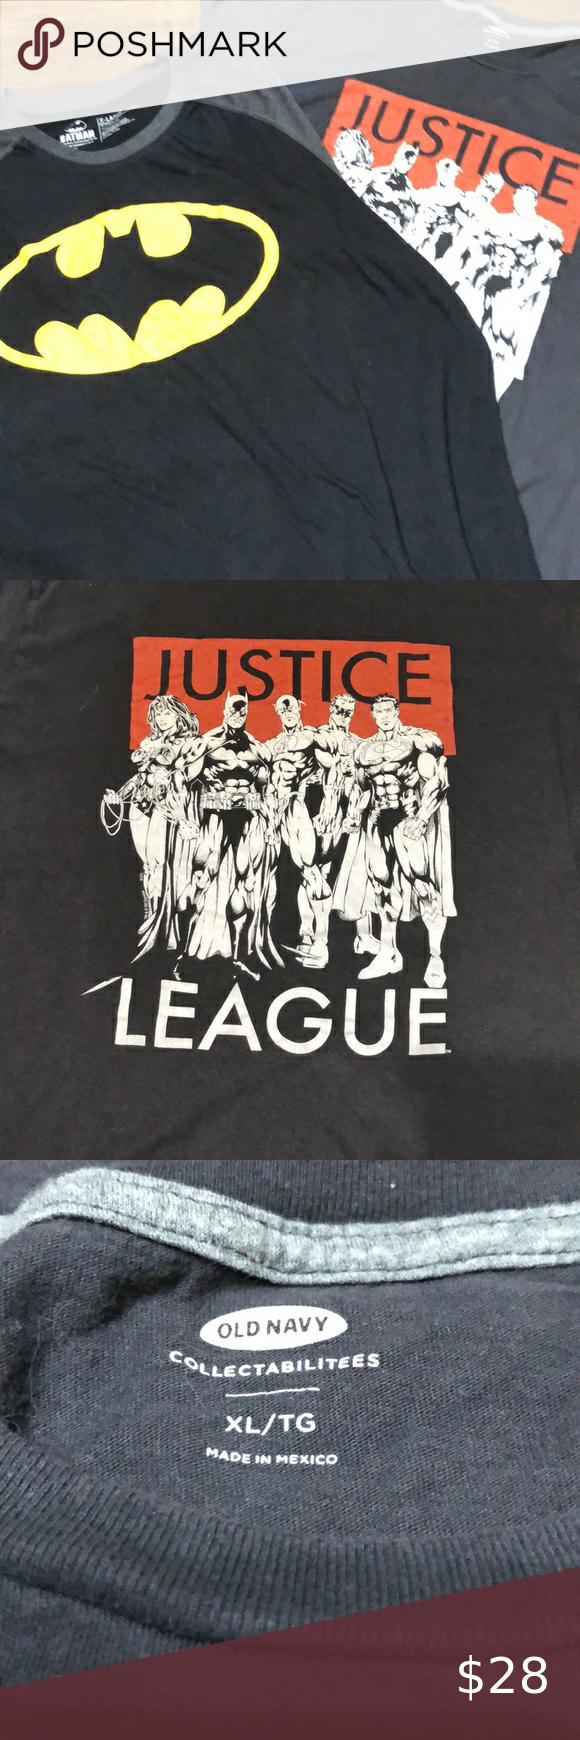 Bundle Batman And Justice League Graphic Tees Justice League Shirt Graphic Tees Batman Shirt